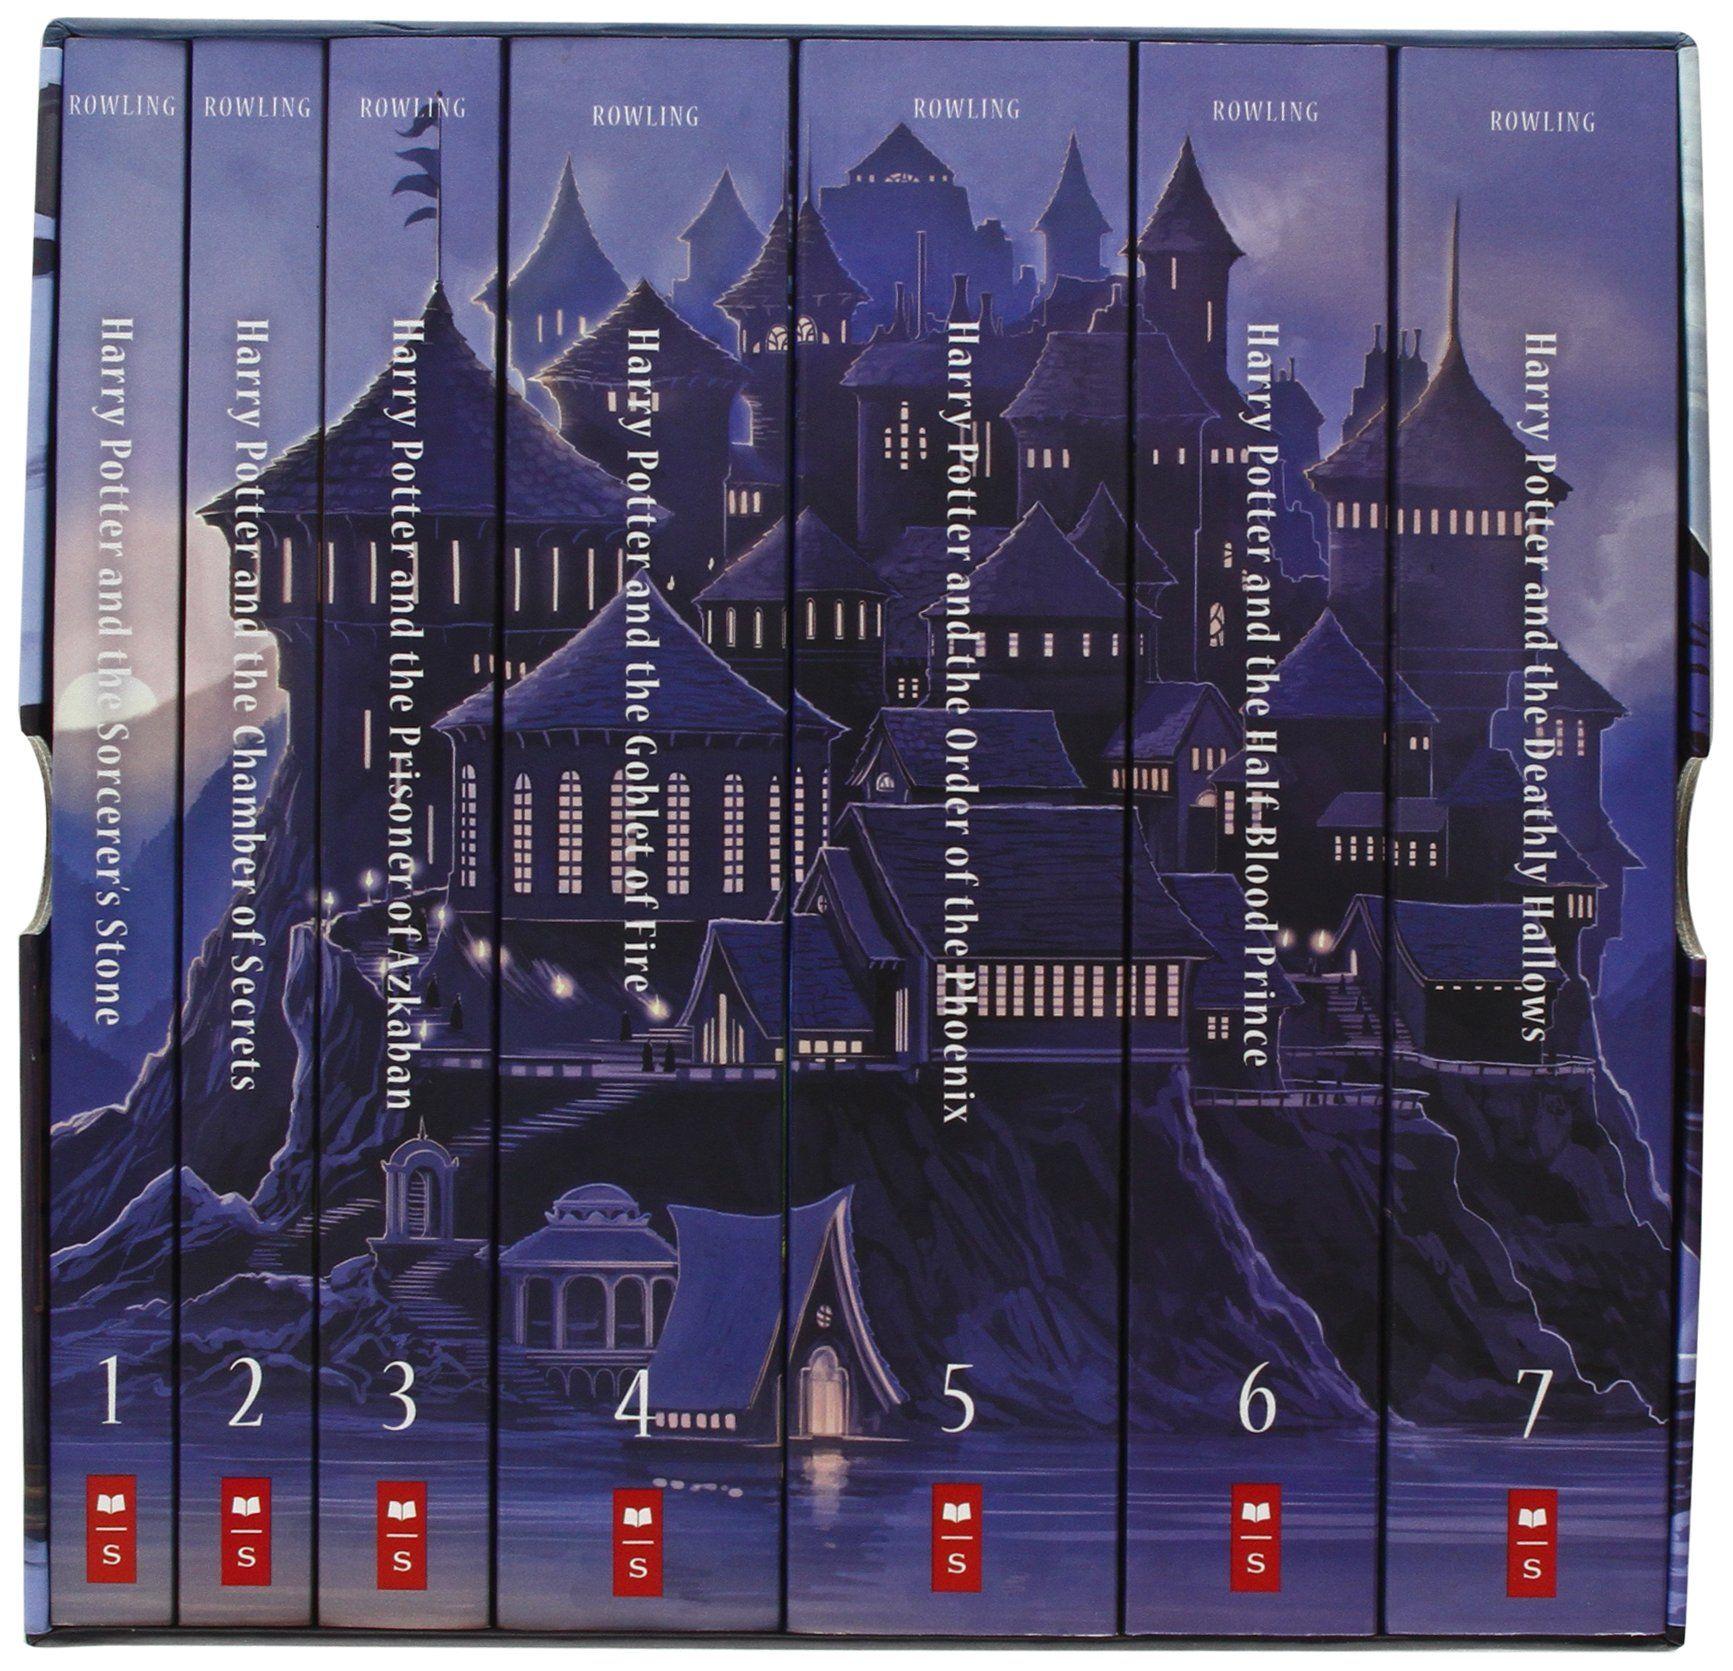 Special Edition Harry Potter Paperback Box Set J K Rowling Kazu Kibuishi Mary Grandpre 97805 Harry Potter Book Set Harry Potter Box Set Harry Potter Books